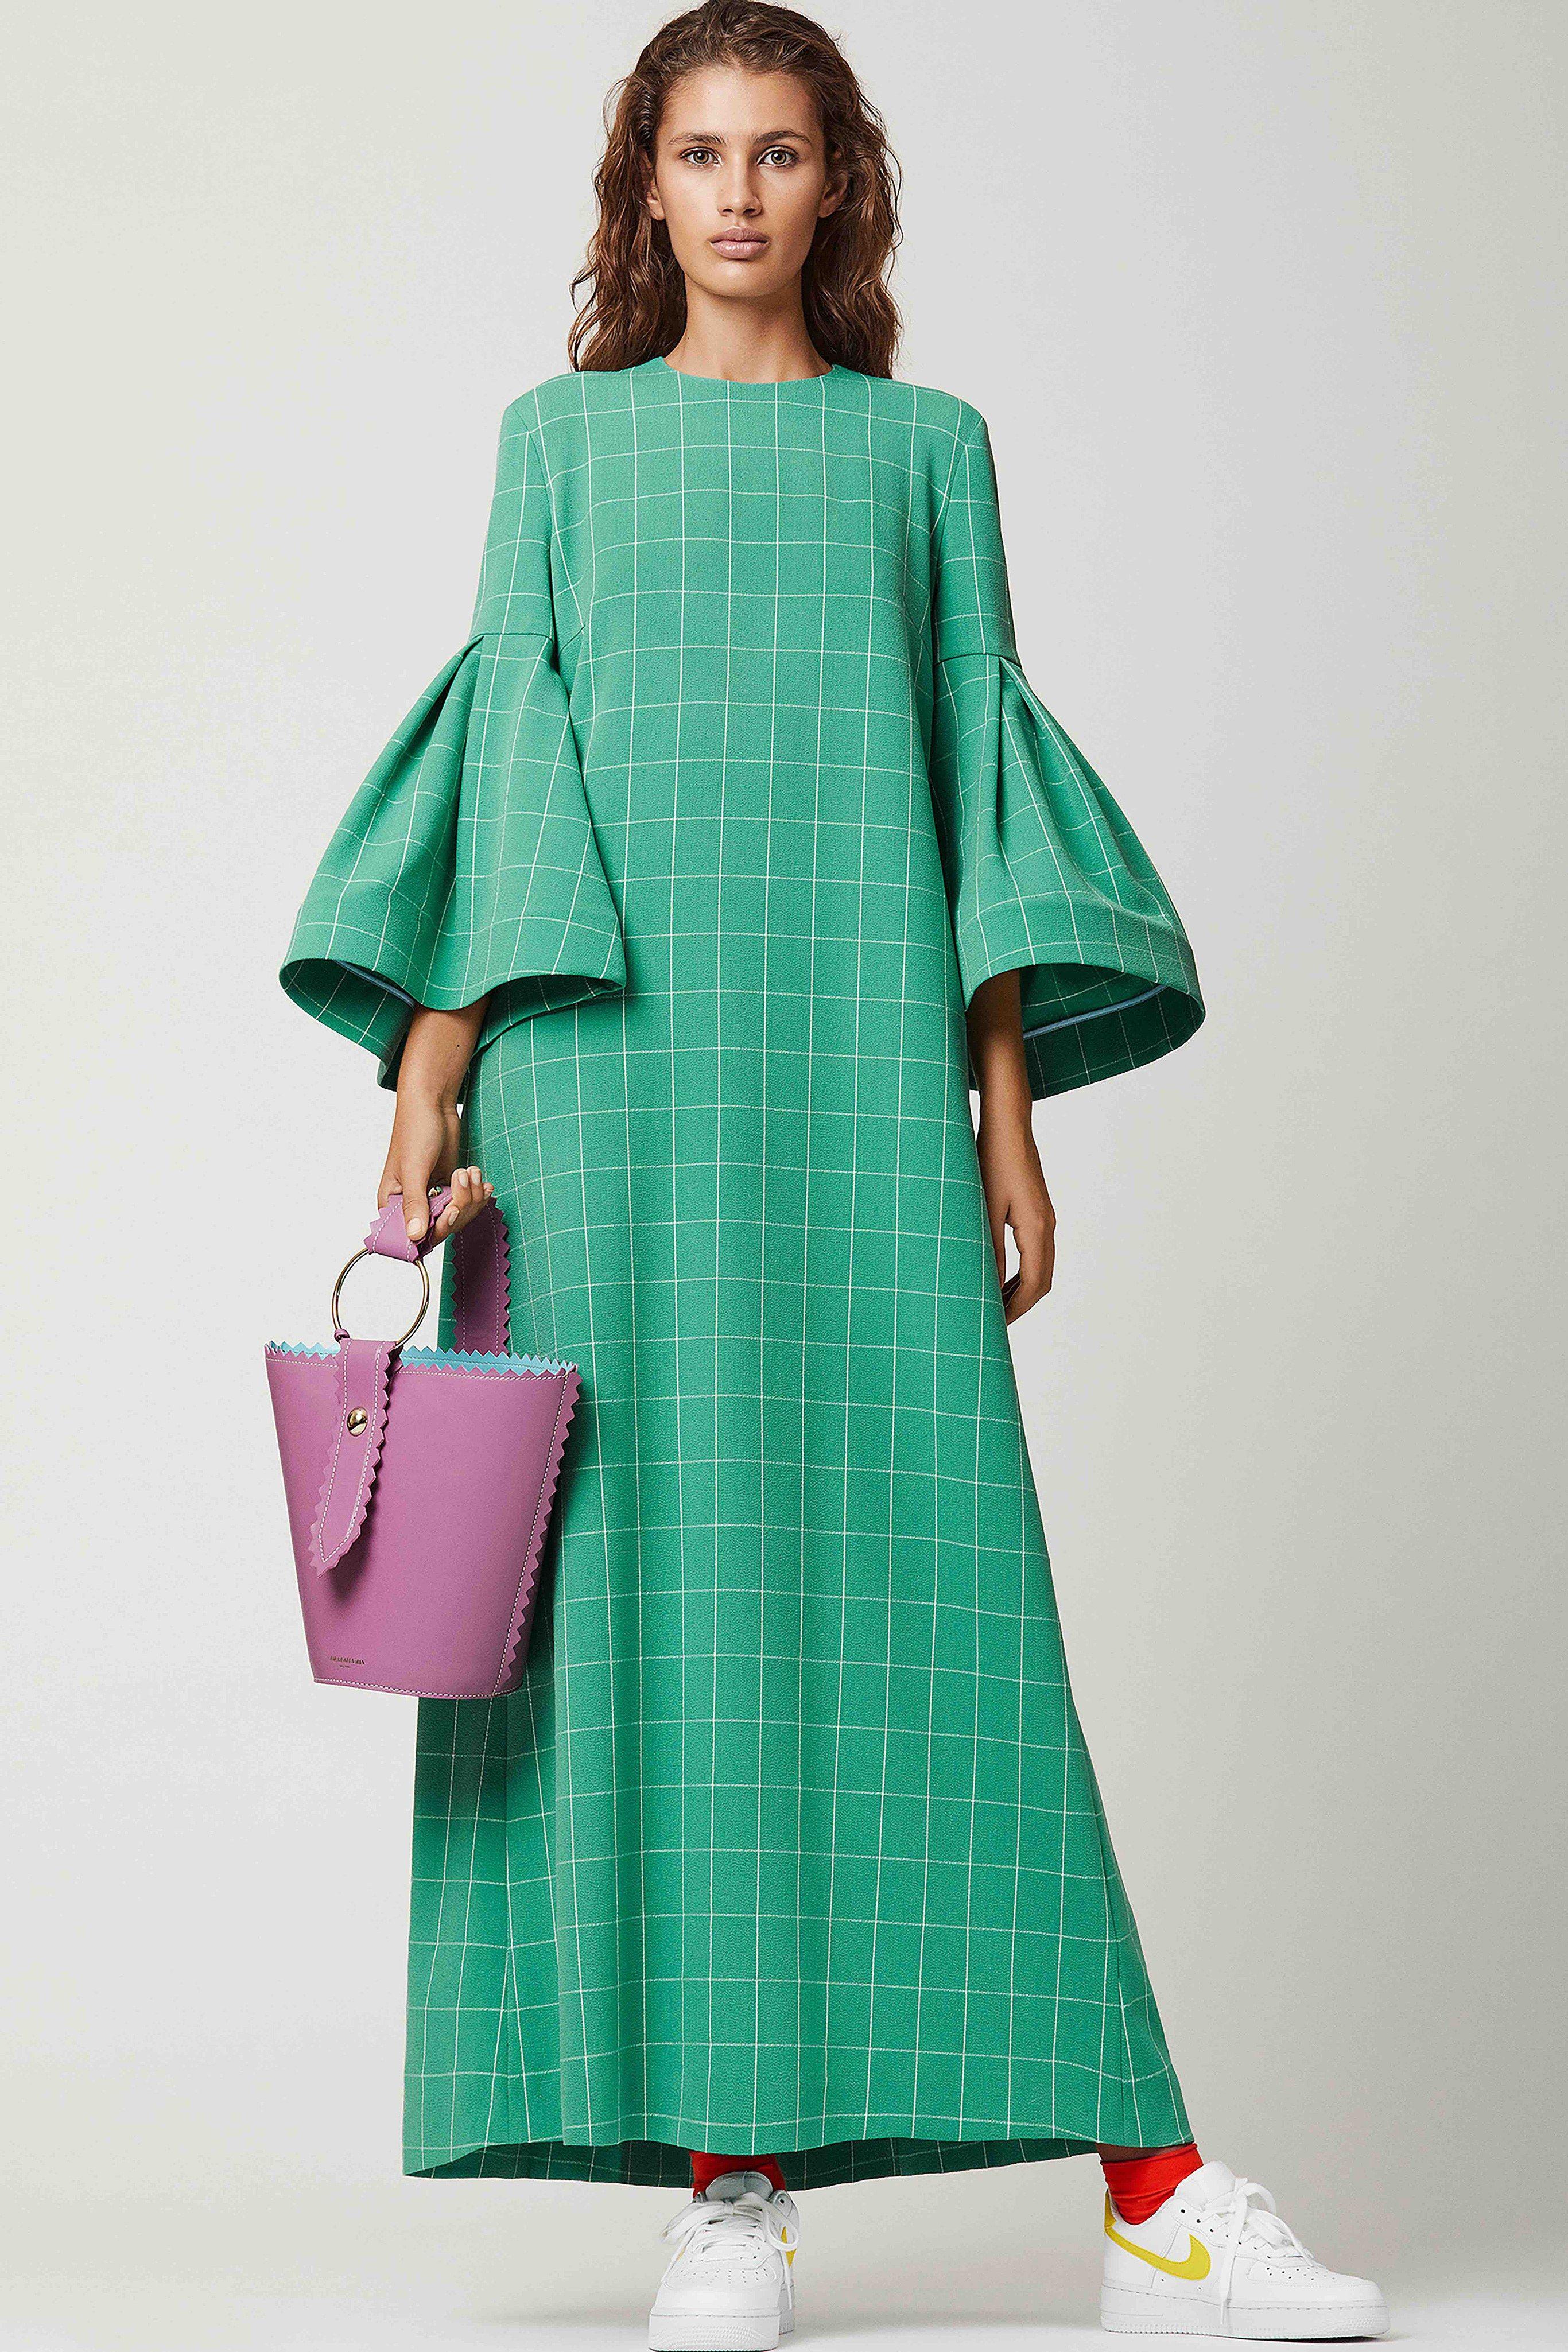 Vestidos largos de calle 2019